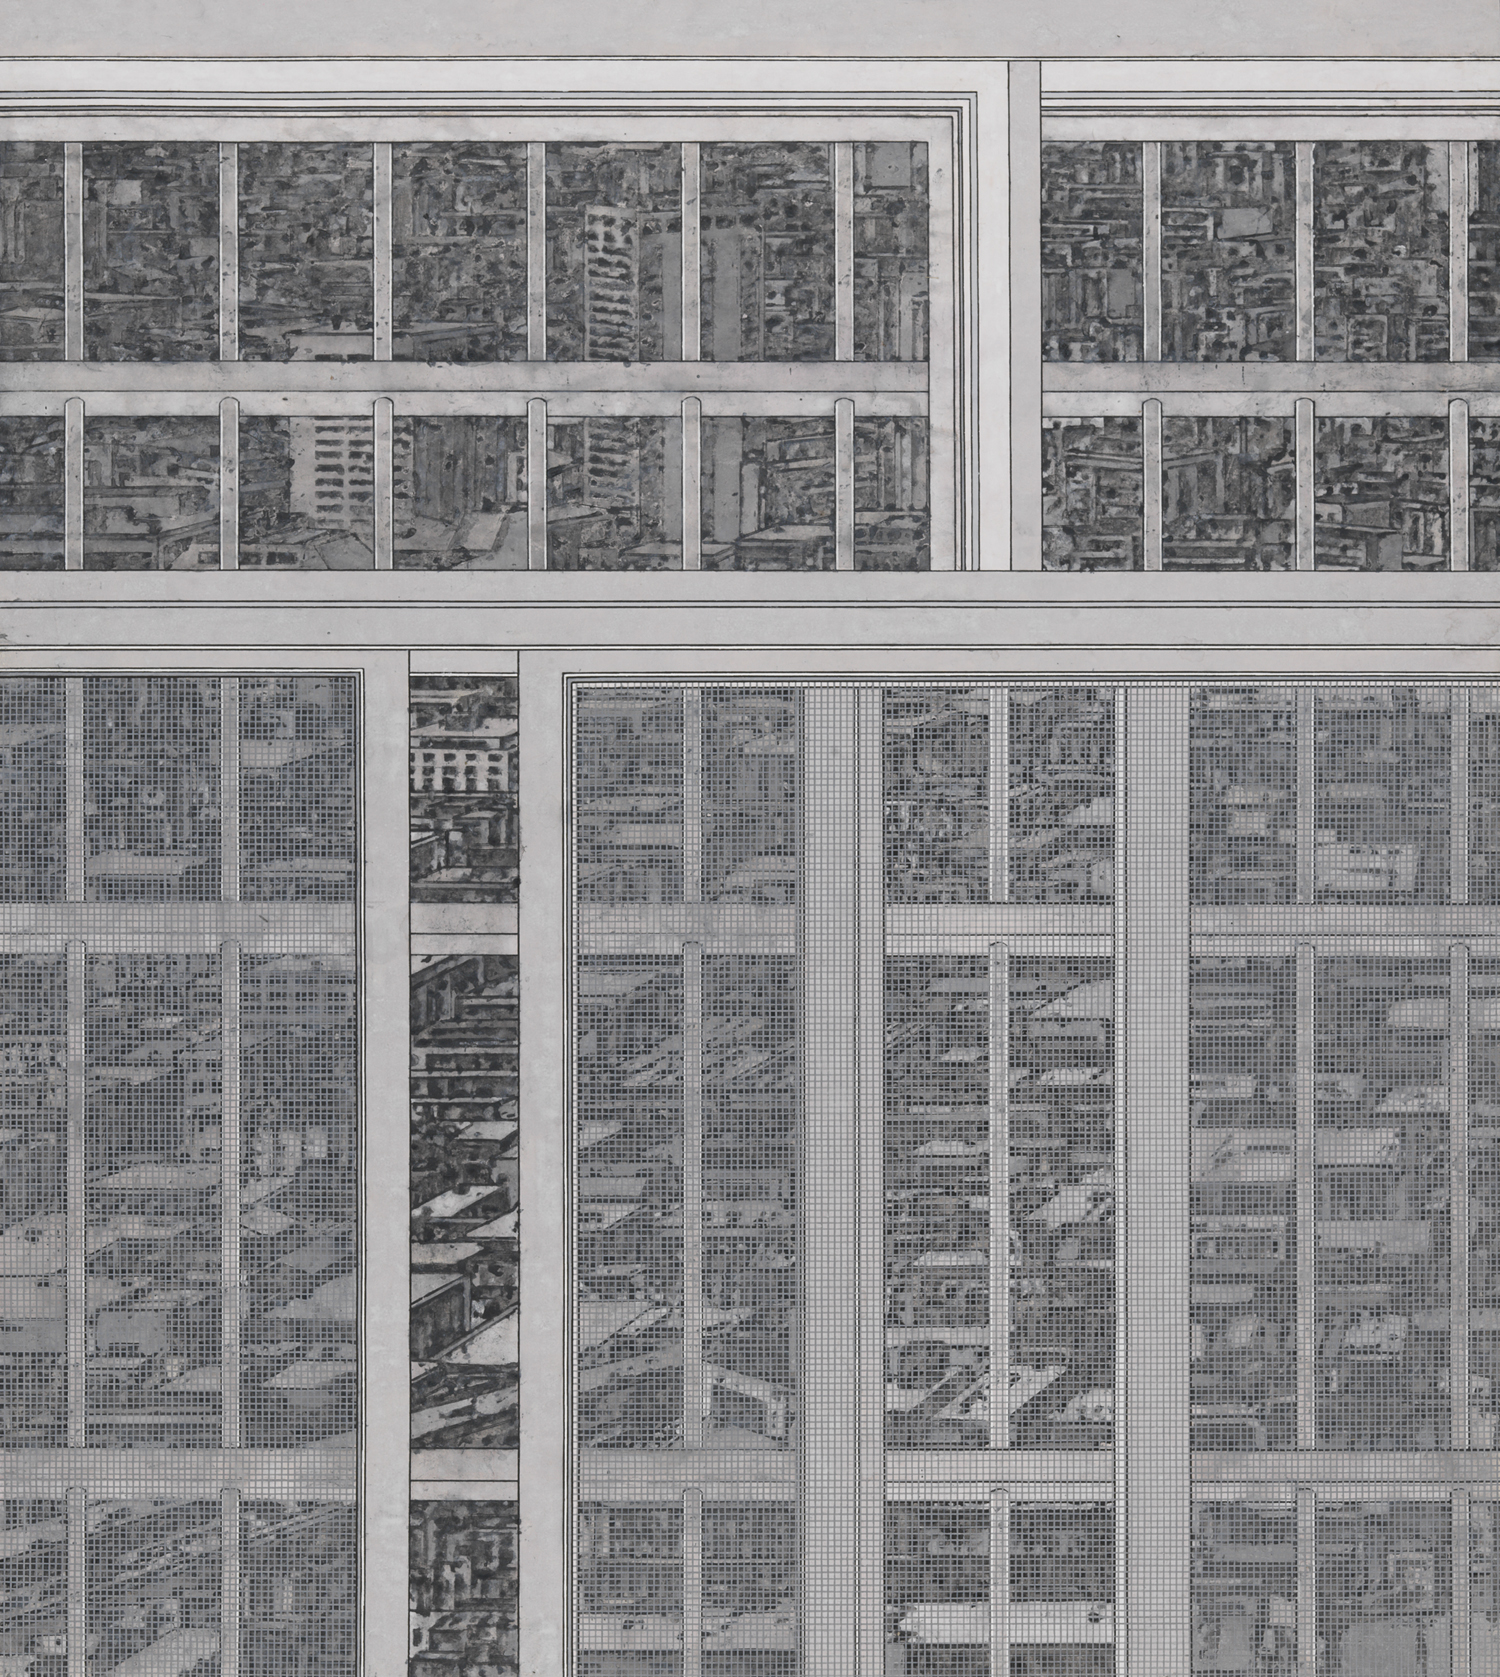 Peng Jian 彭剑, One Meter Away - Window, Glass, Screen, City 一米以外 — 窗, 玻璃, 保笼, 城市, 2011, Ink and color on paper 纸本水墨设色, 132 x 118 cm